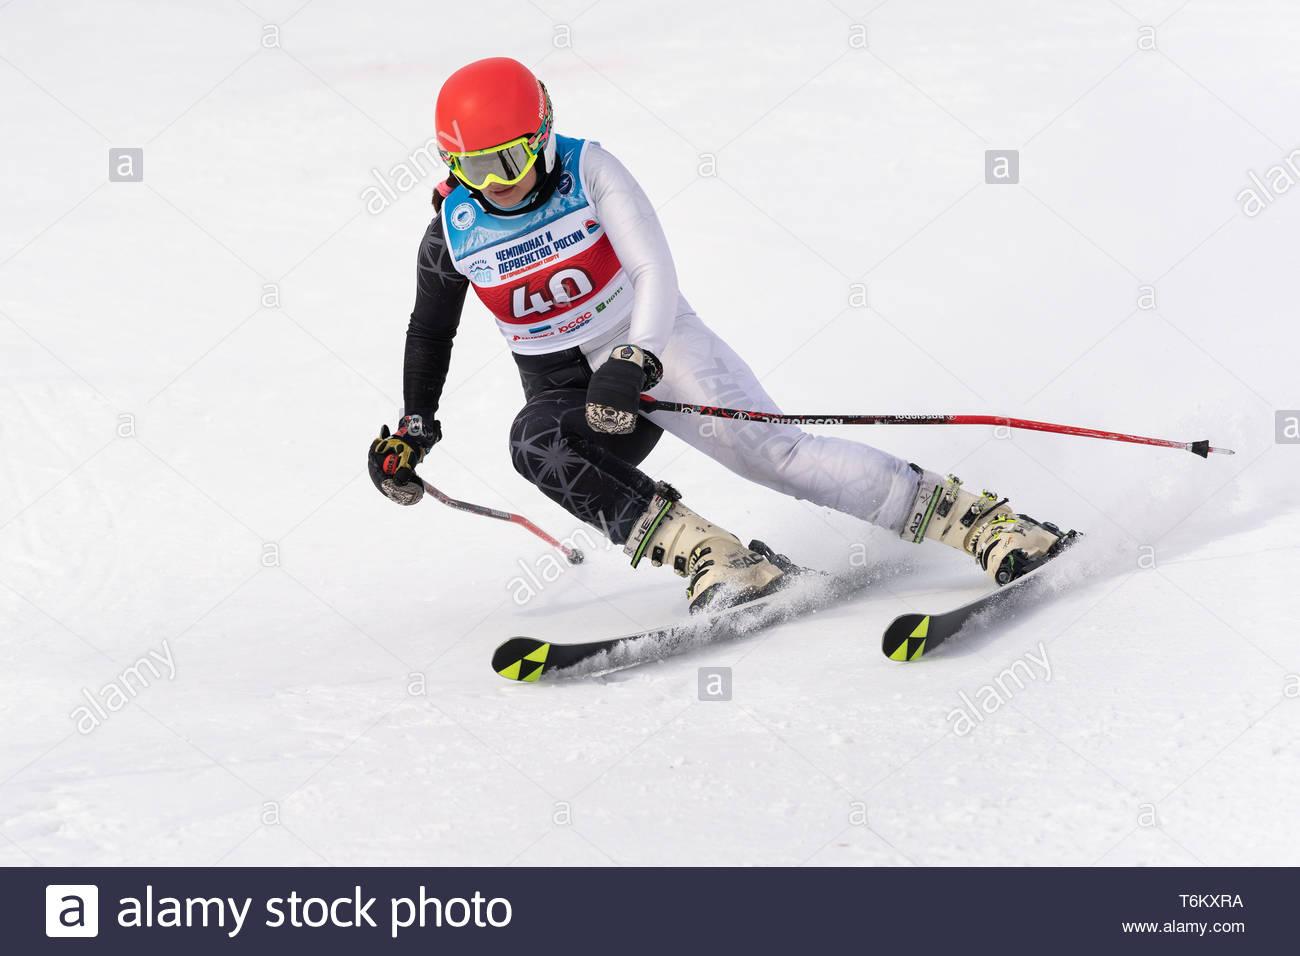 KAMCHATKA, RUSSIA - APRIL 2, 2019: Mountain skier Kudryavtseva Ekaterina (St. Petersburg) skiing down mount. International Ski Federation Championship - Stock Image